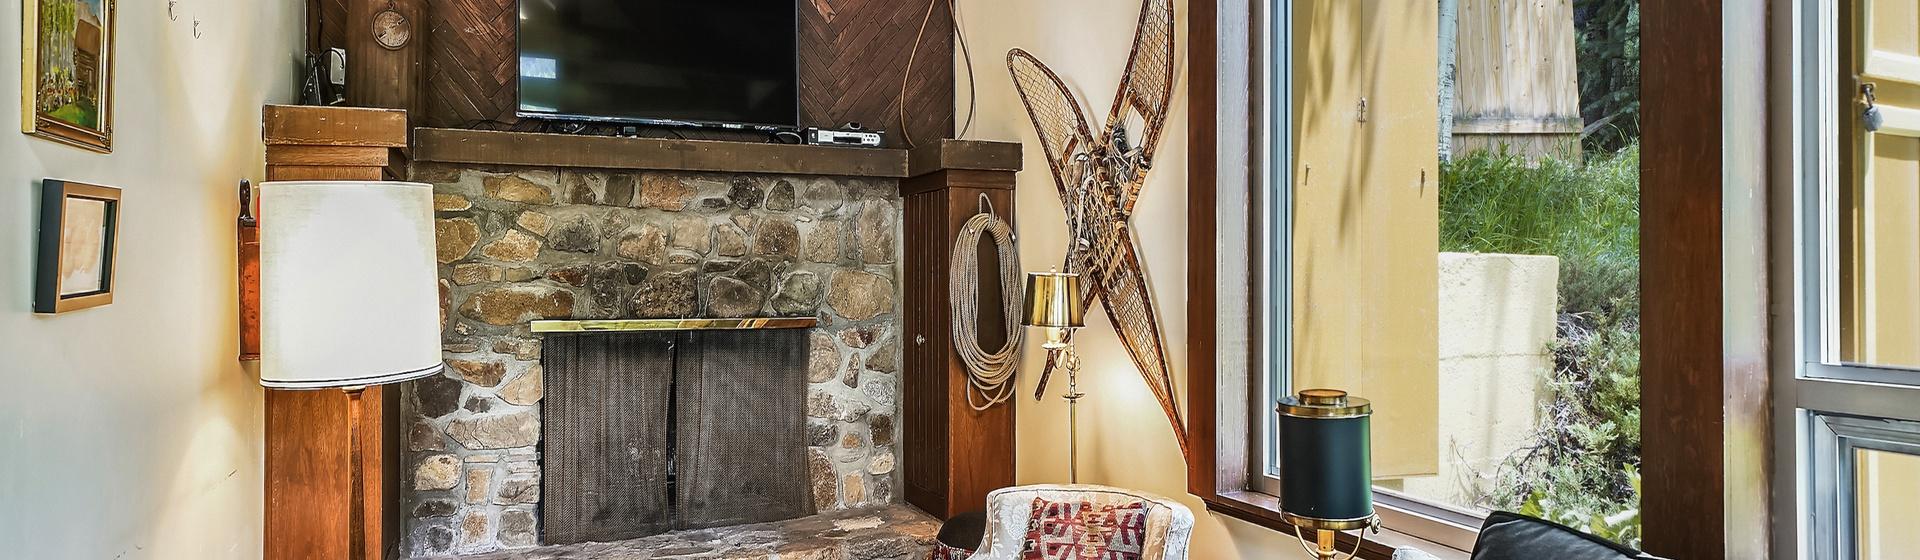 2.01-telluride-summer-haus-Living Room-web.jpg